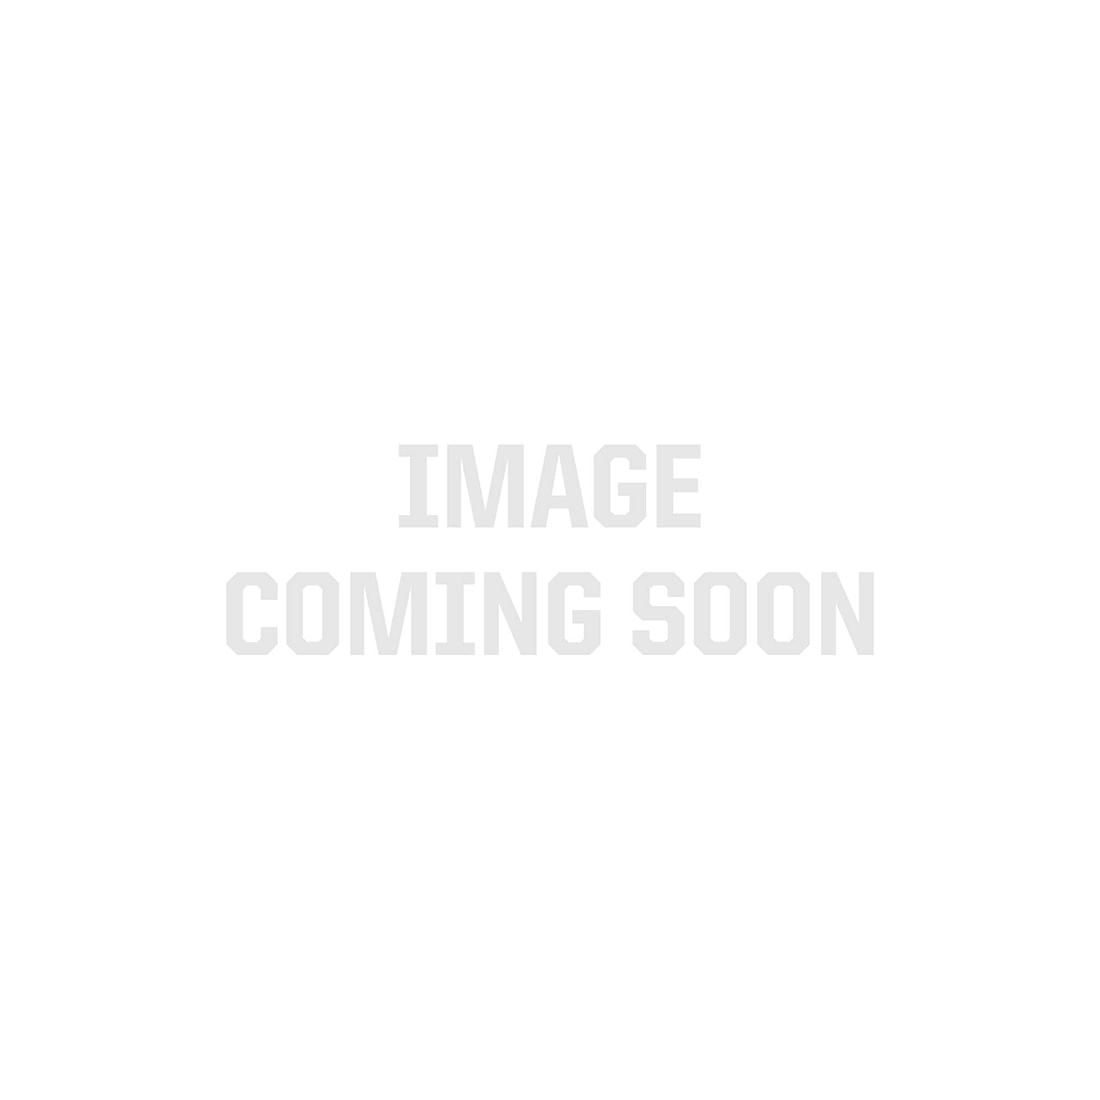 Dimmable 4 inch LED Downlight Retrofit Fixture 11 Watt 120 VAC Warm White 2,700K MaxLite